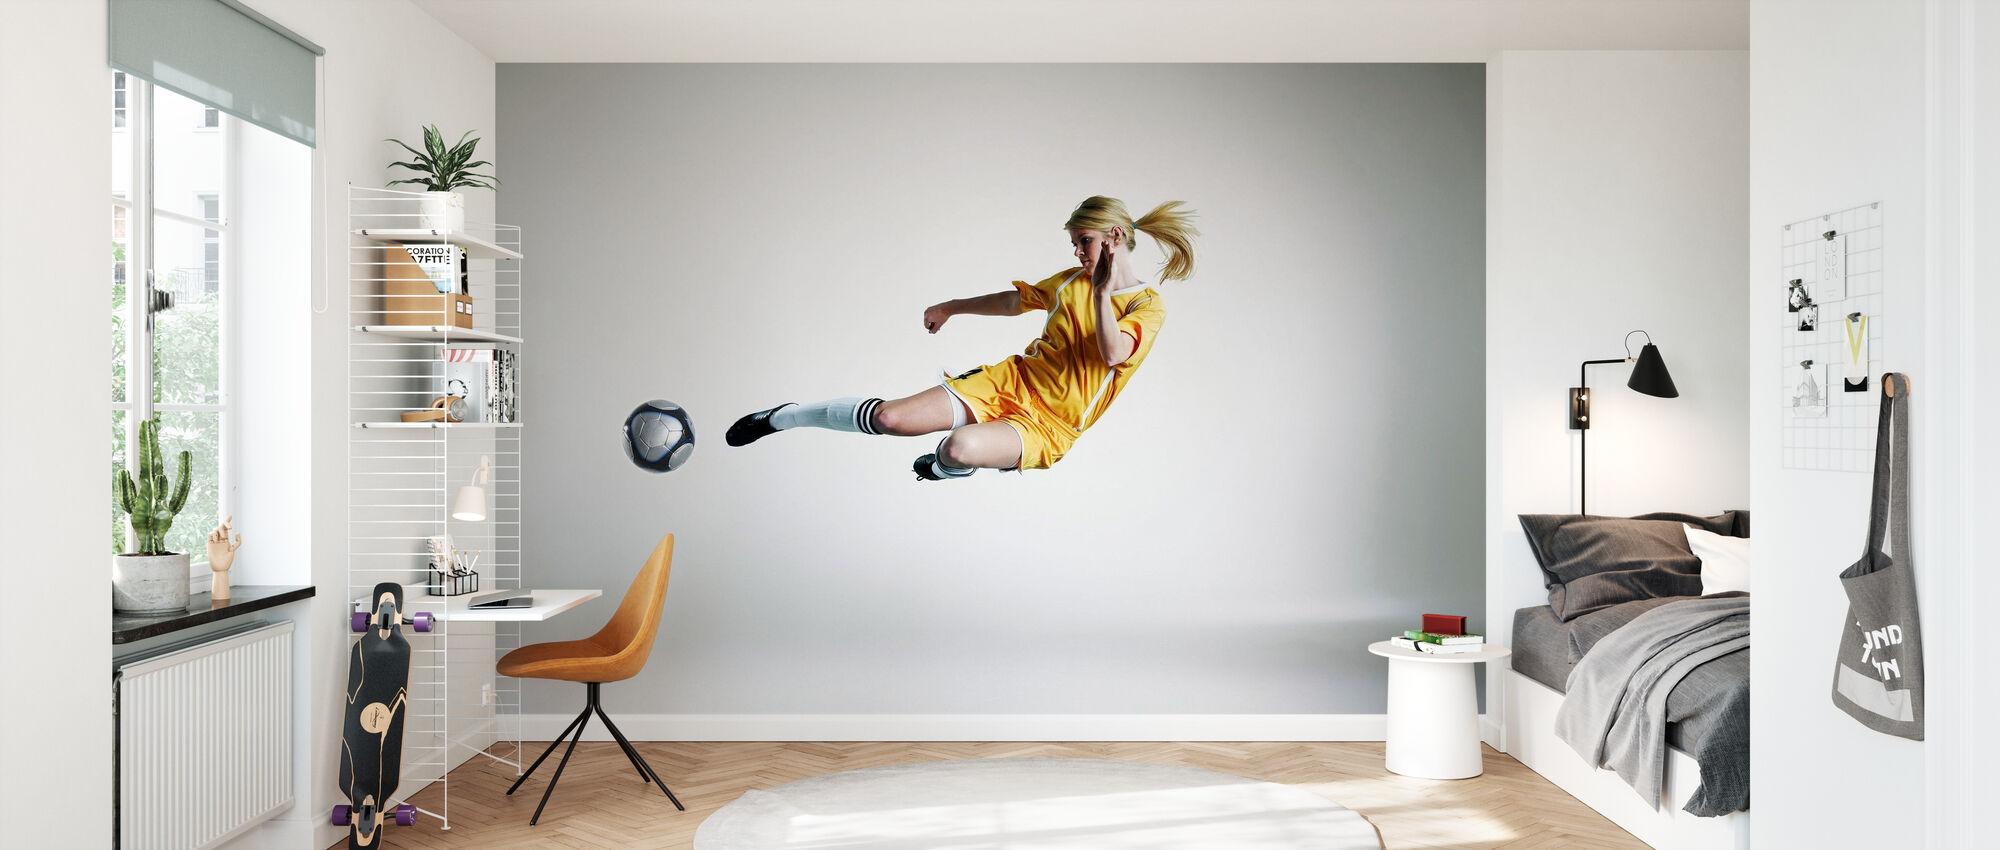 Skilled Player - Wallpaper - Kids Room